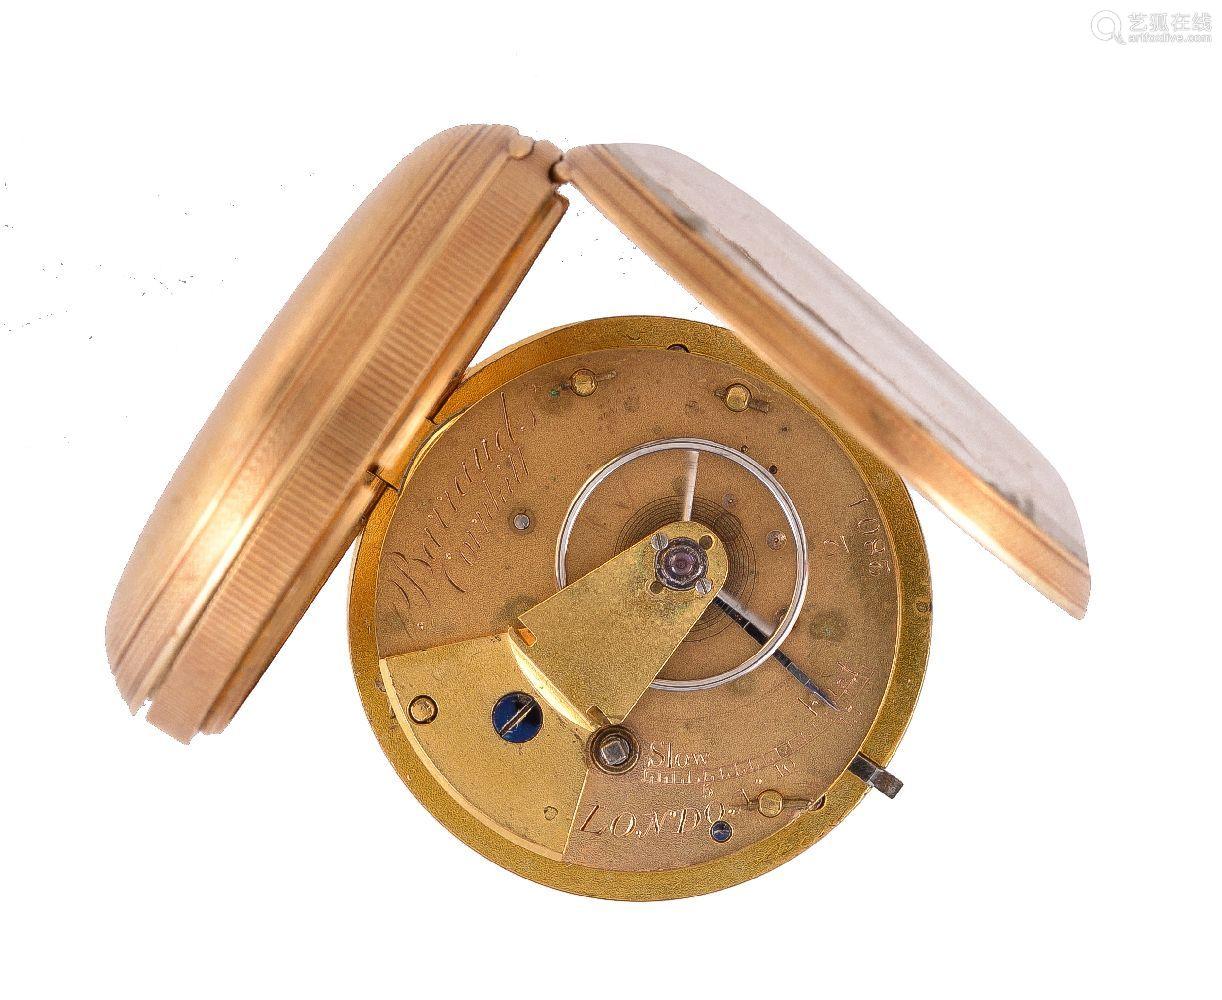 Barraud, London,18 carat gold pocket watch